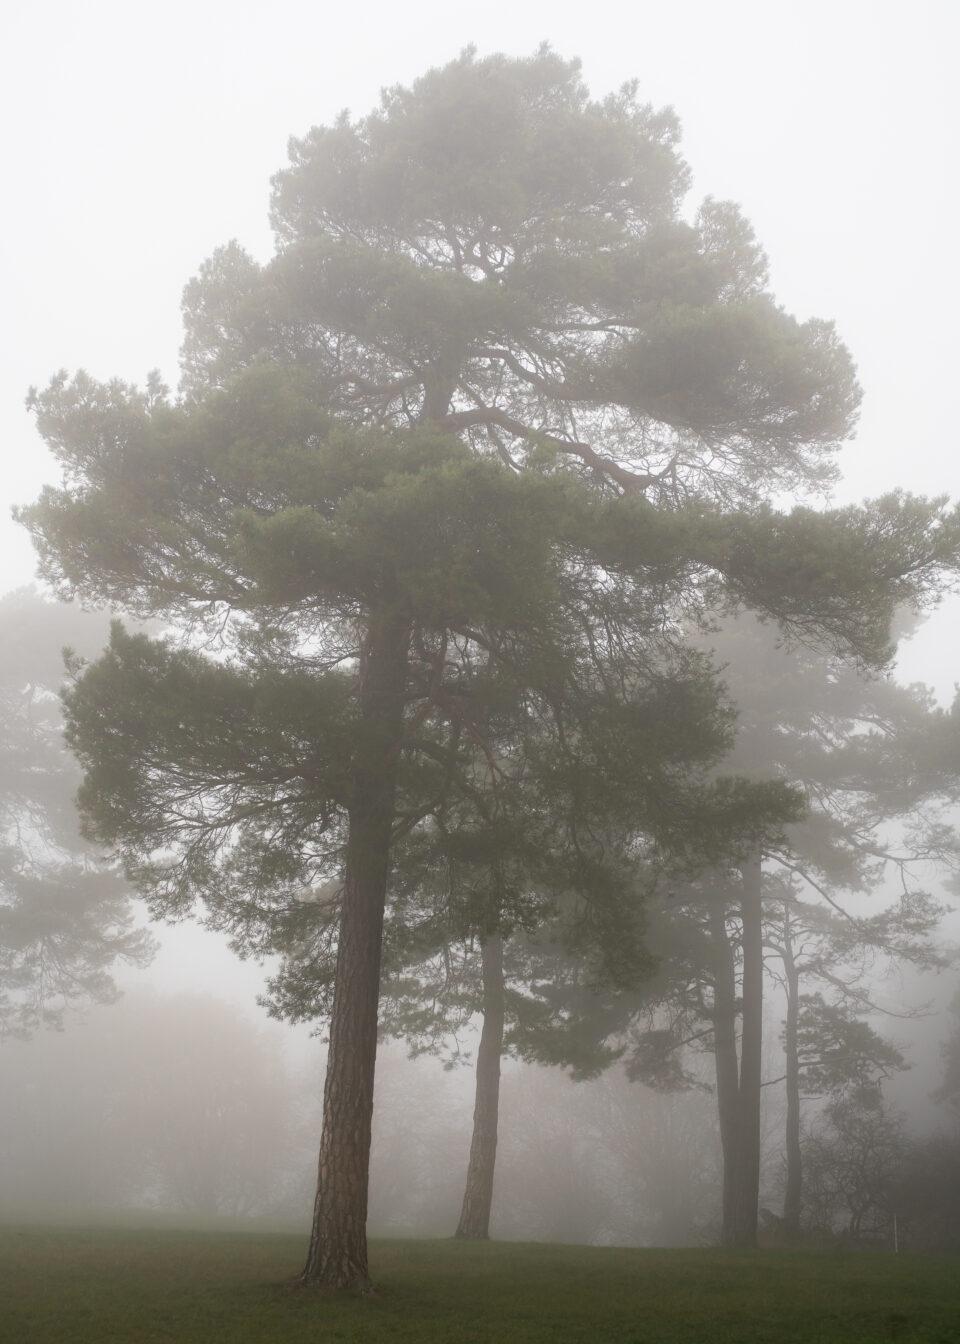 Karsten Rohrbeck: November-Nebel in NRW (4)